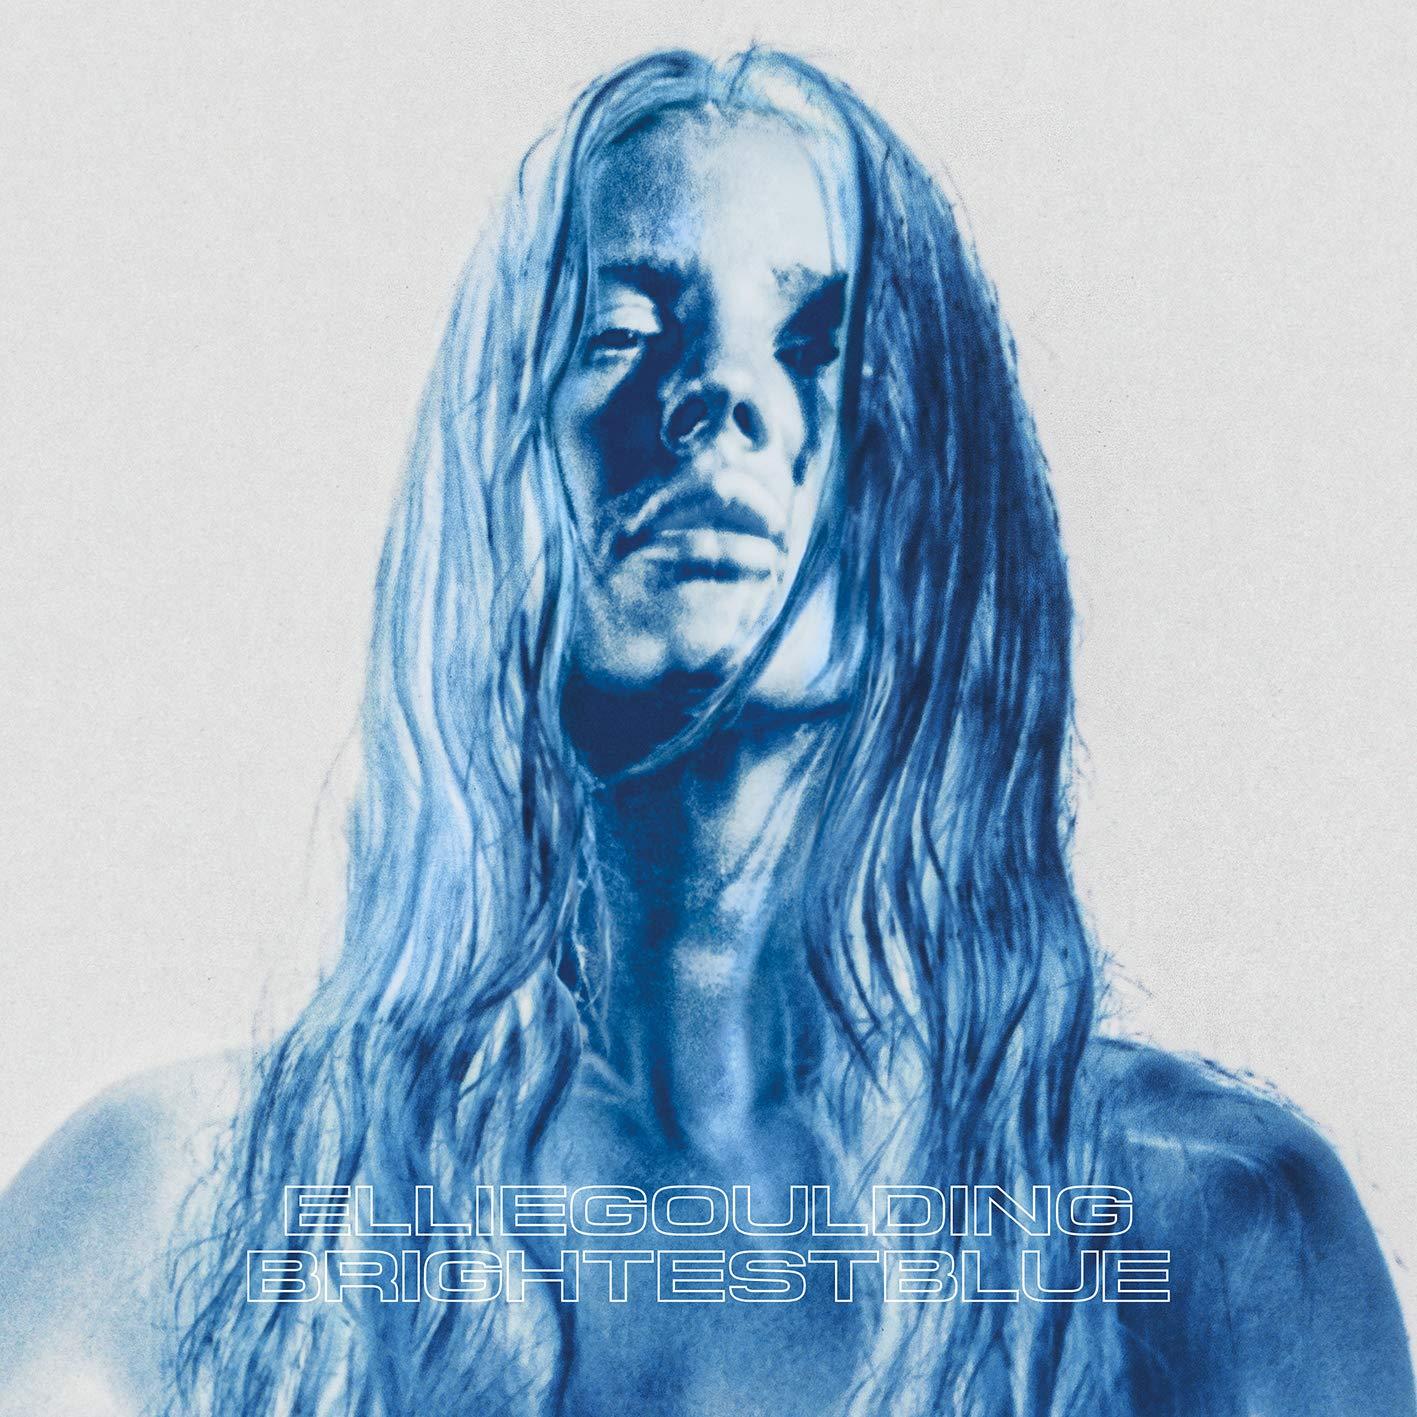 Ellie Goulding - Brightest Blue (2020) [FLAC] Download